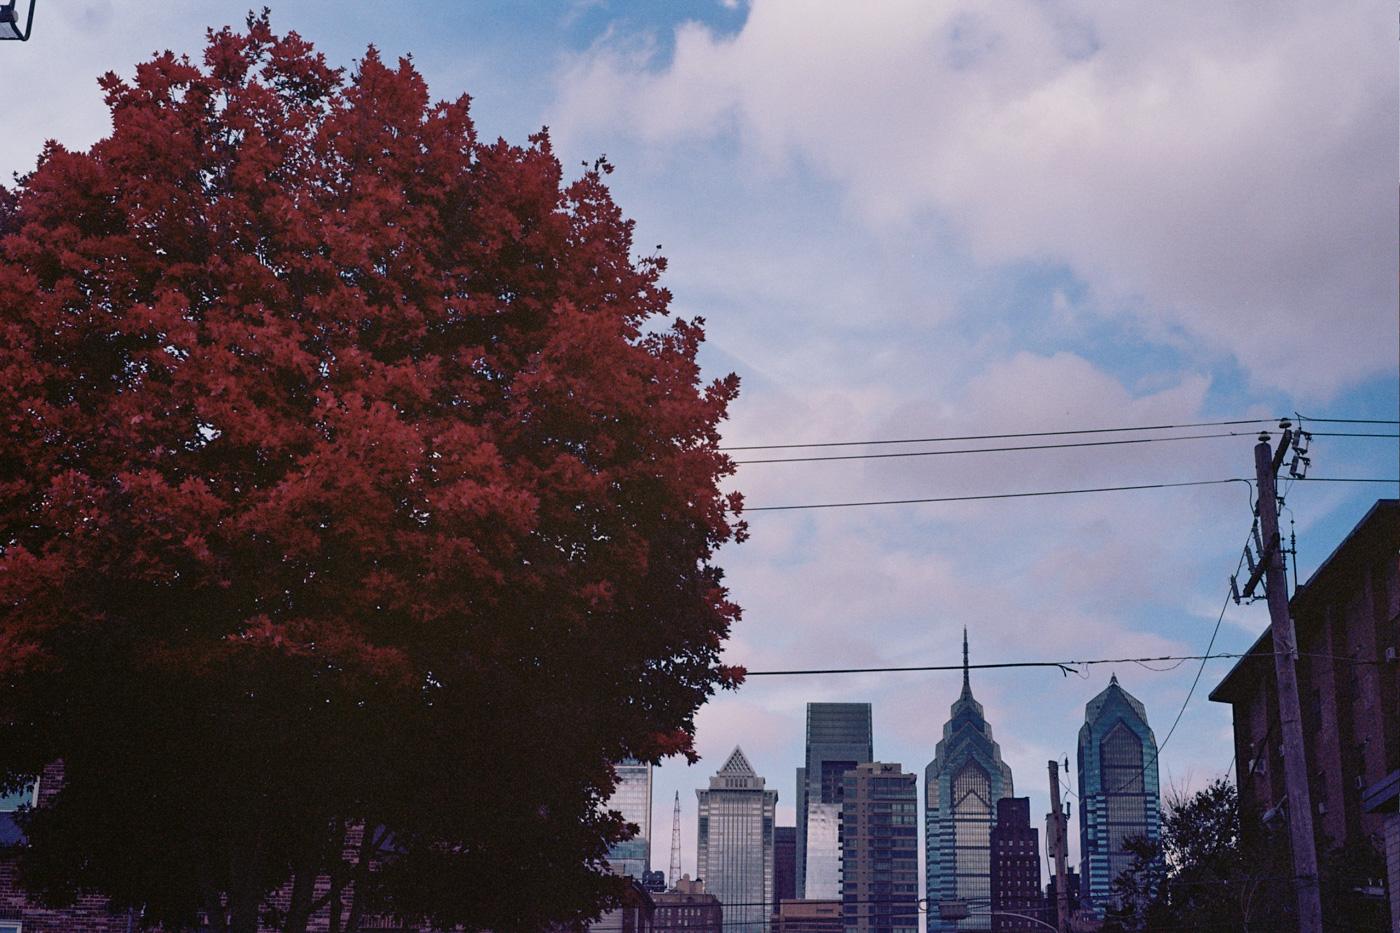 Autumn Tree and Philly Skyline